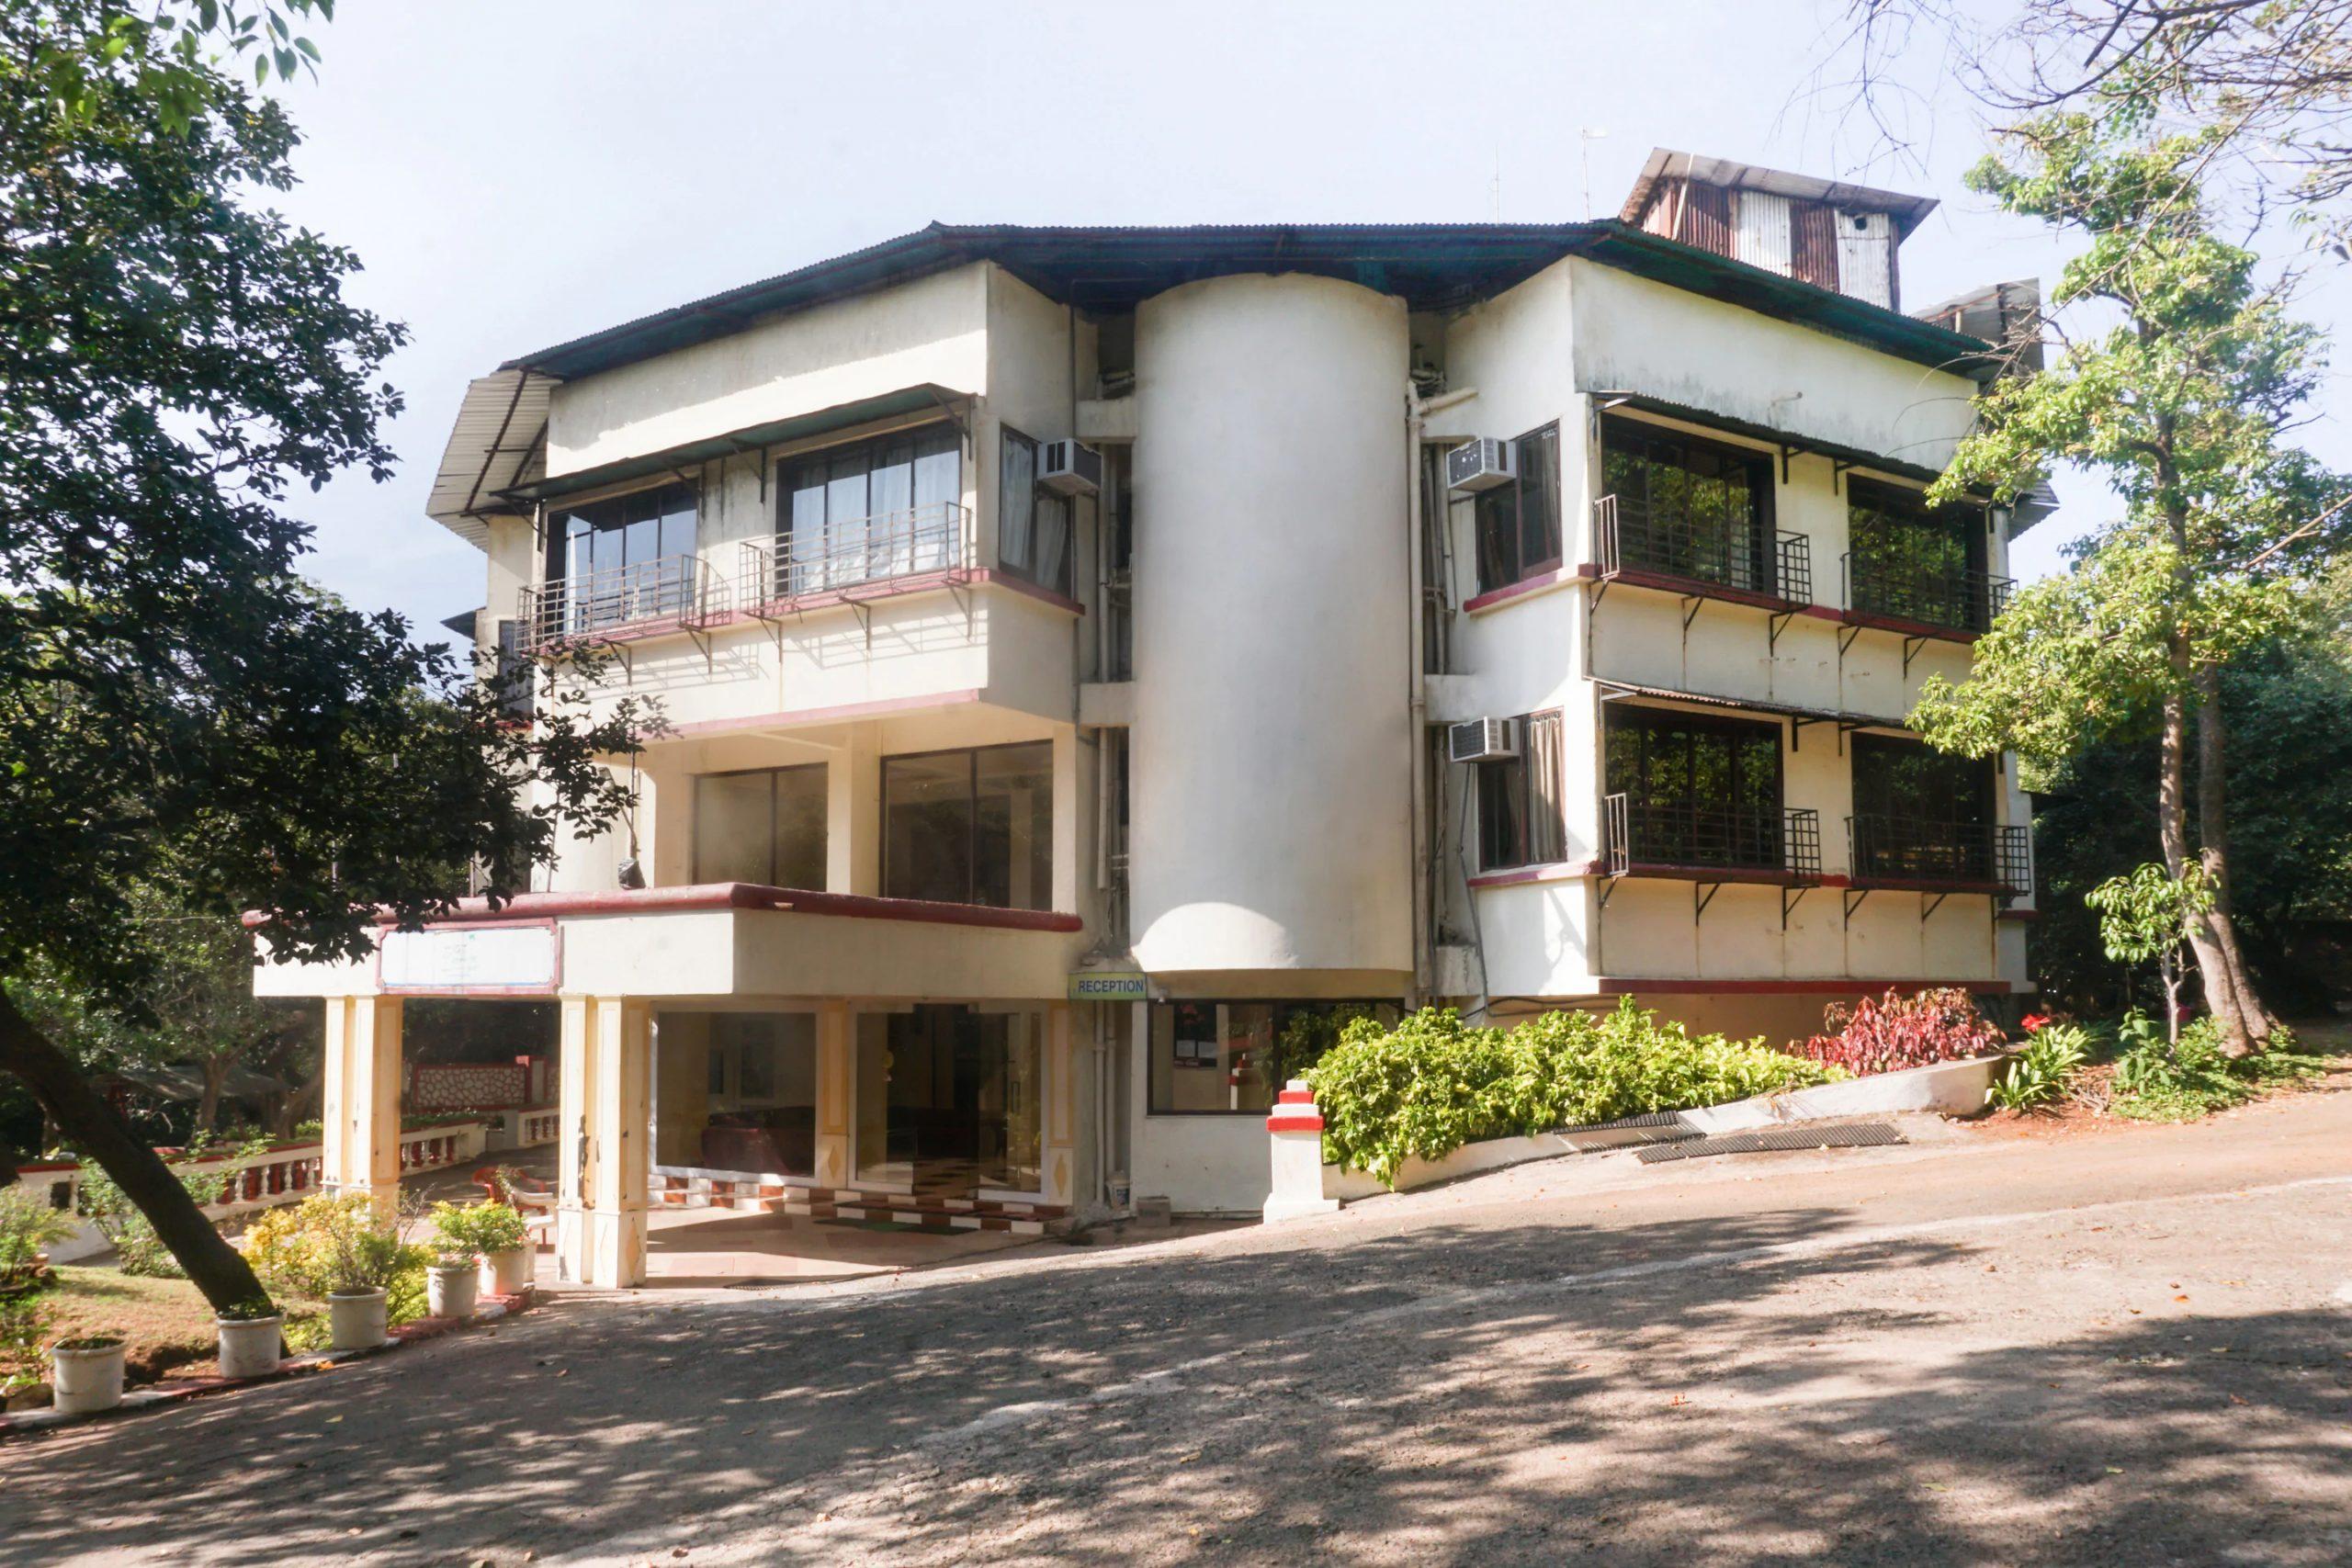 Ishwar Inn Resort - Best Luxury Hotels in Mahabaleshwar